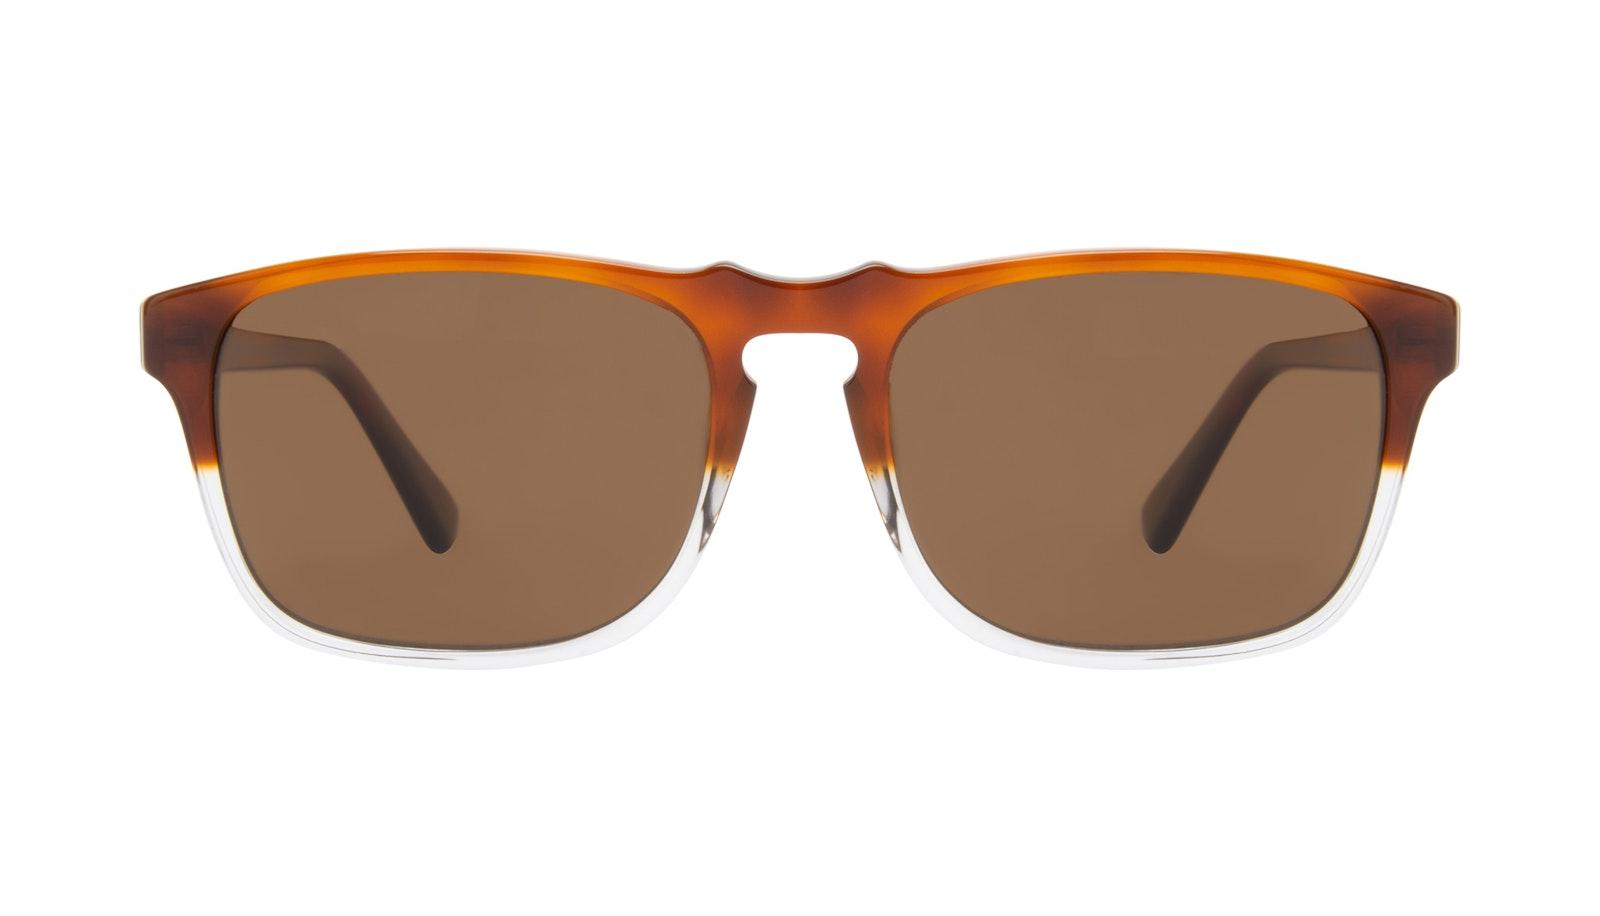 Affordable Fashion Glasses Square Sunglasses Men Raceway Havana Clear